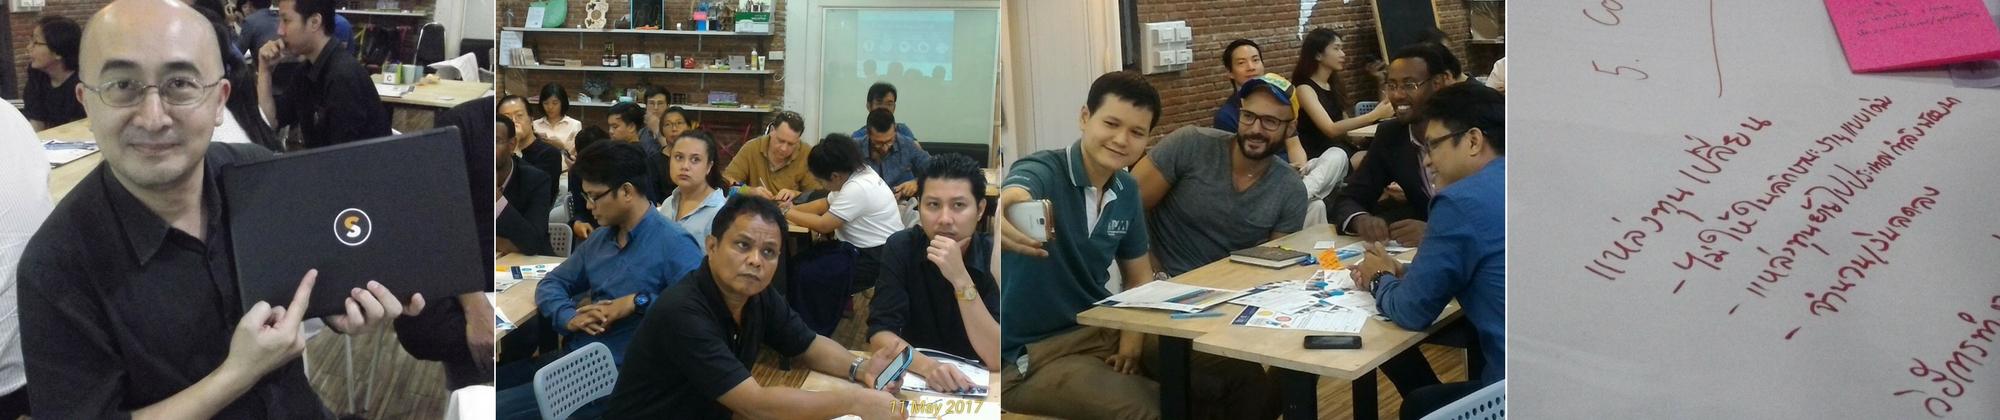 TechSoup Thailand Relaunch